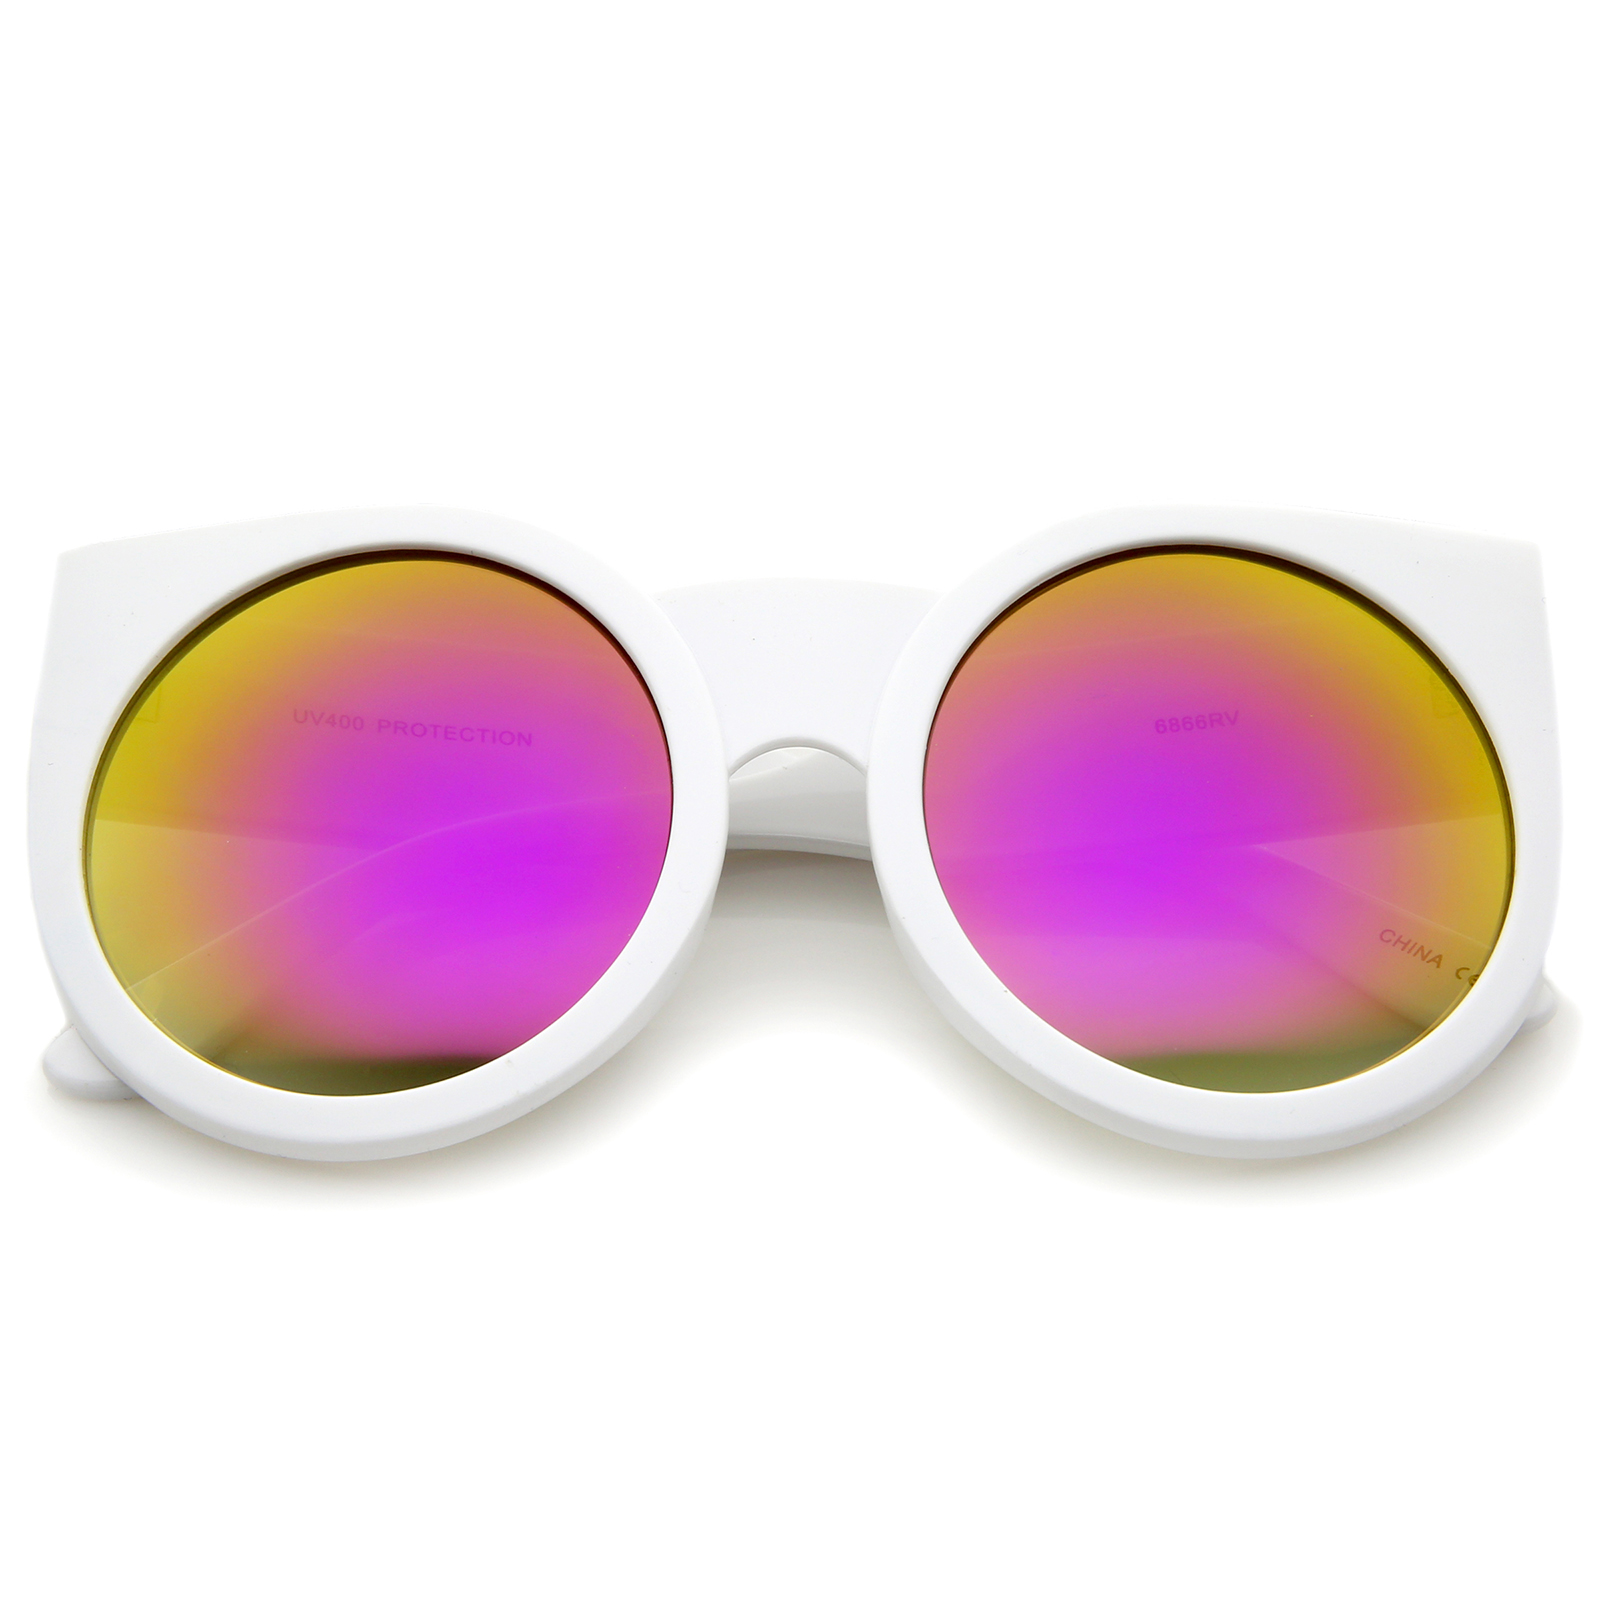 Sunglasses Frames For Thick Lenses : sunglass.LA Womens Thick Frame Color Mirror Lens Round Cat ...